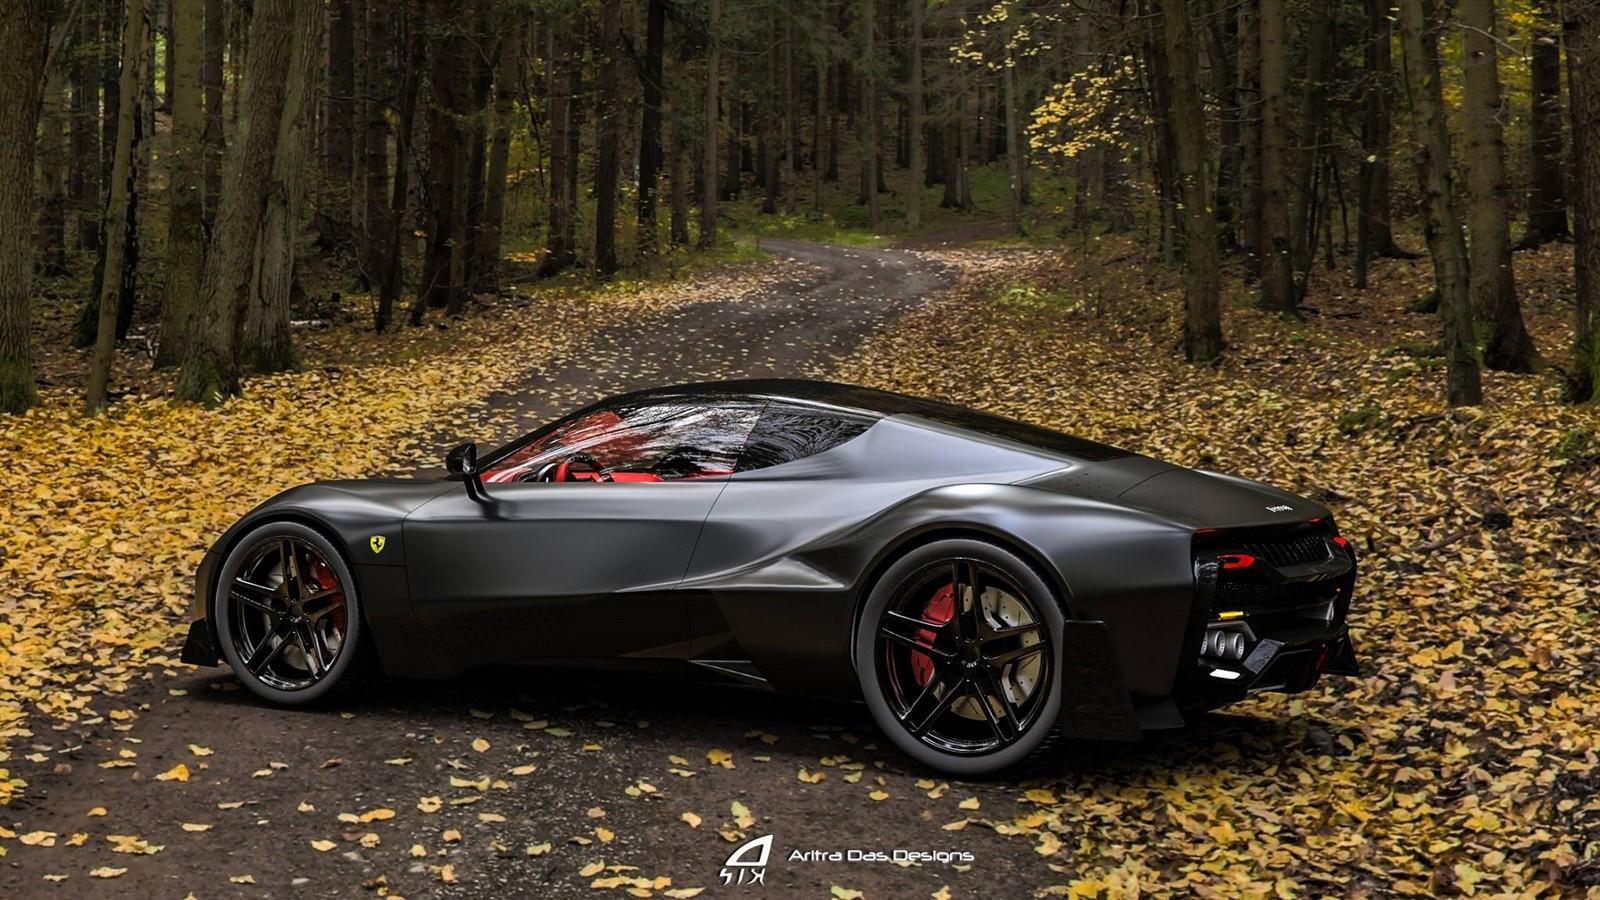 Ferrari Zenyatta Is A Designer S Vision For A New Hypercar